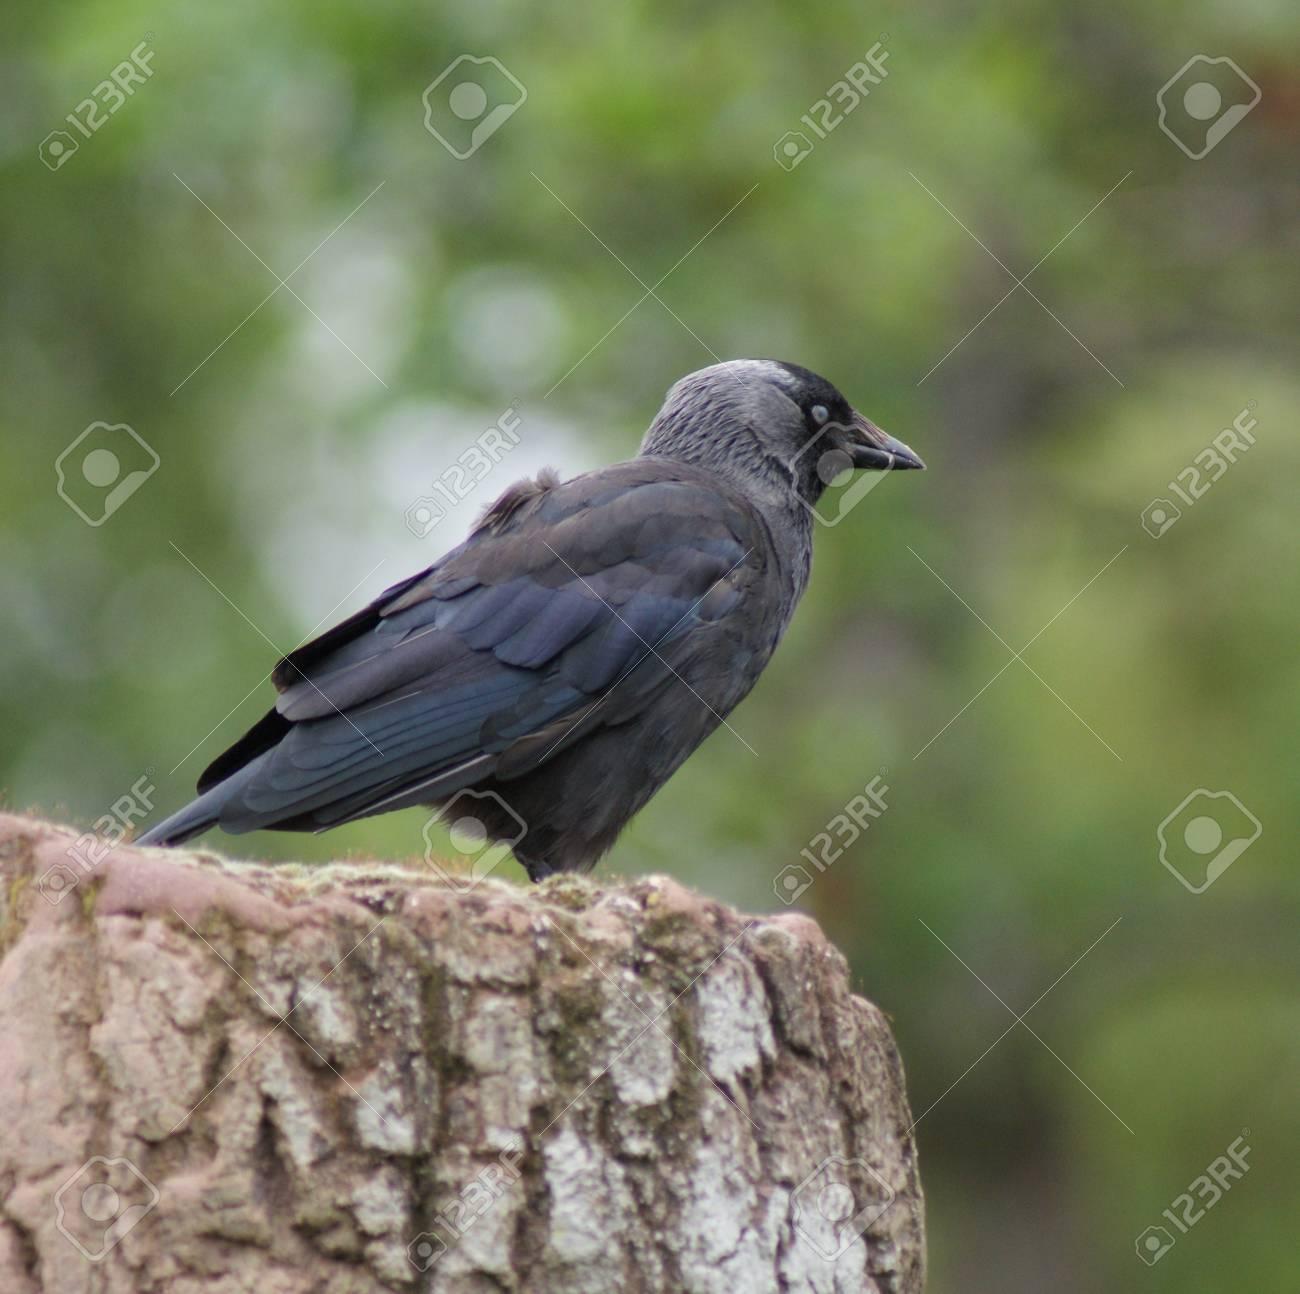 Portait image of a wild Jackdaw - Corvus monedula Stock Photo - 12724280